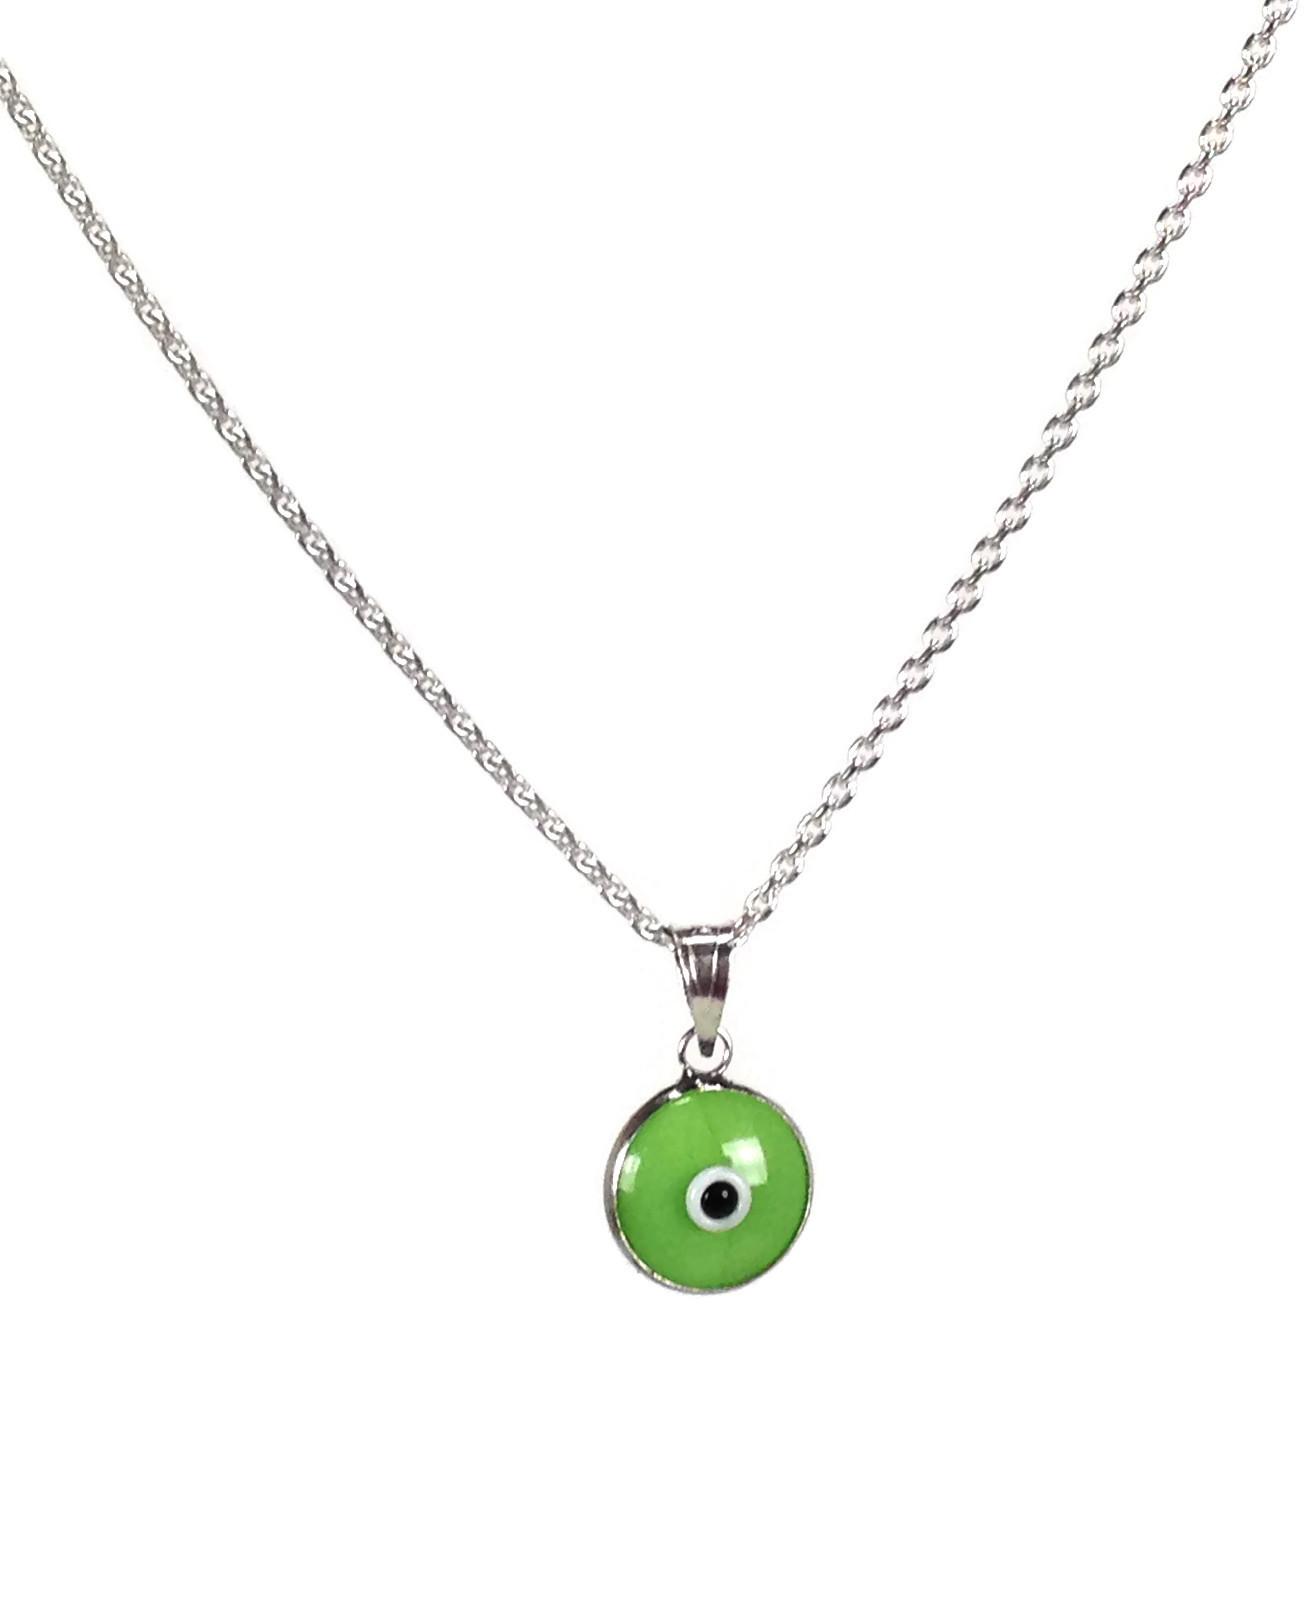 Green evil eye pendant necklace